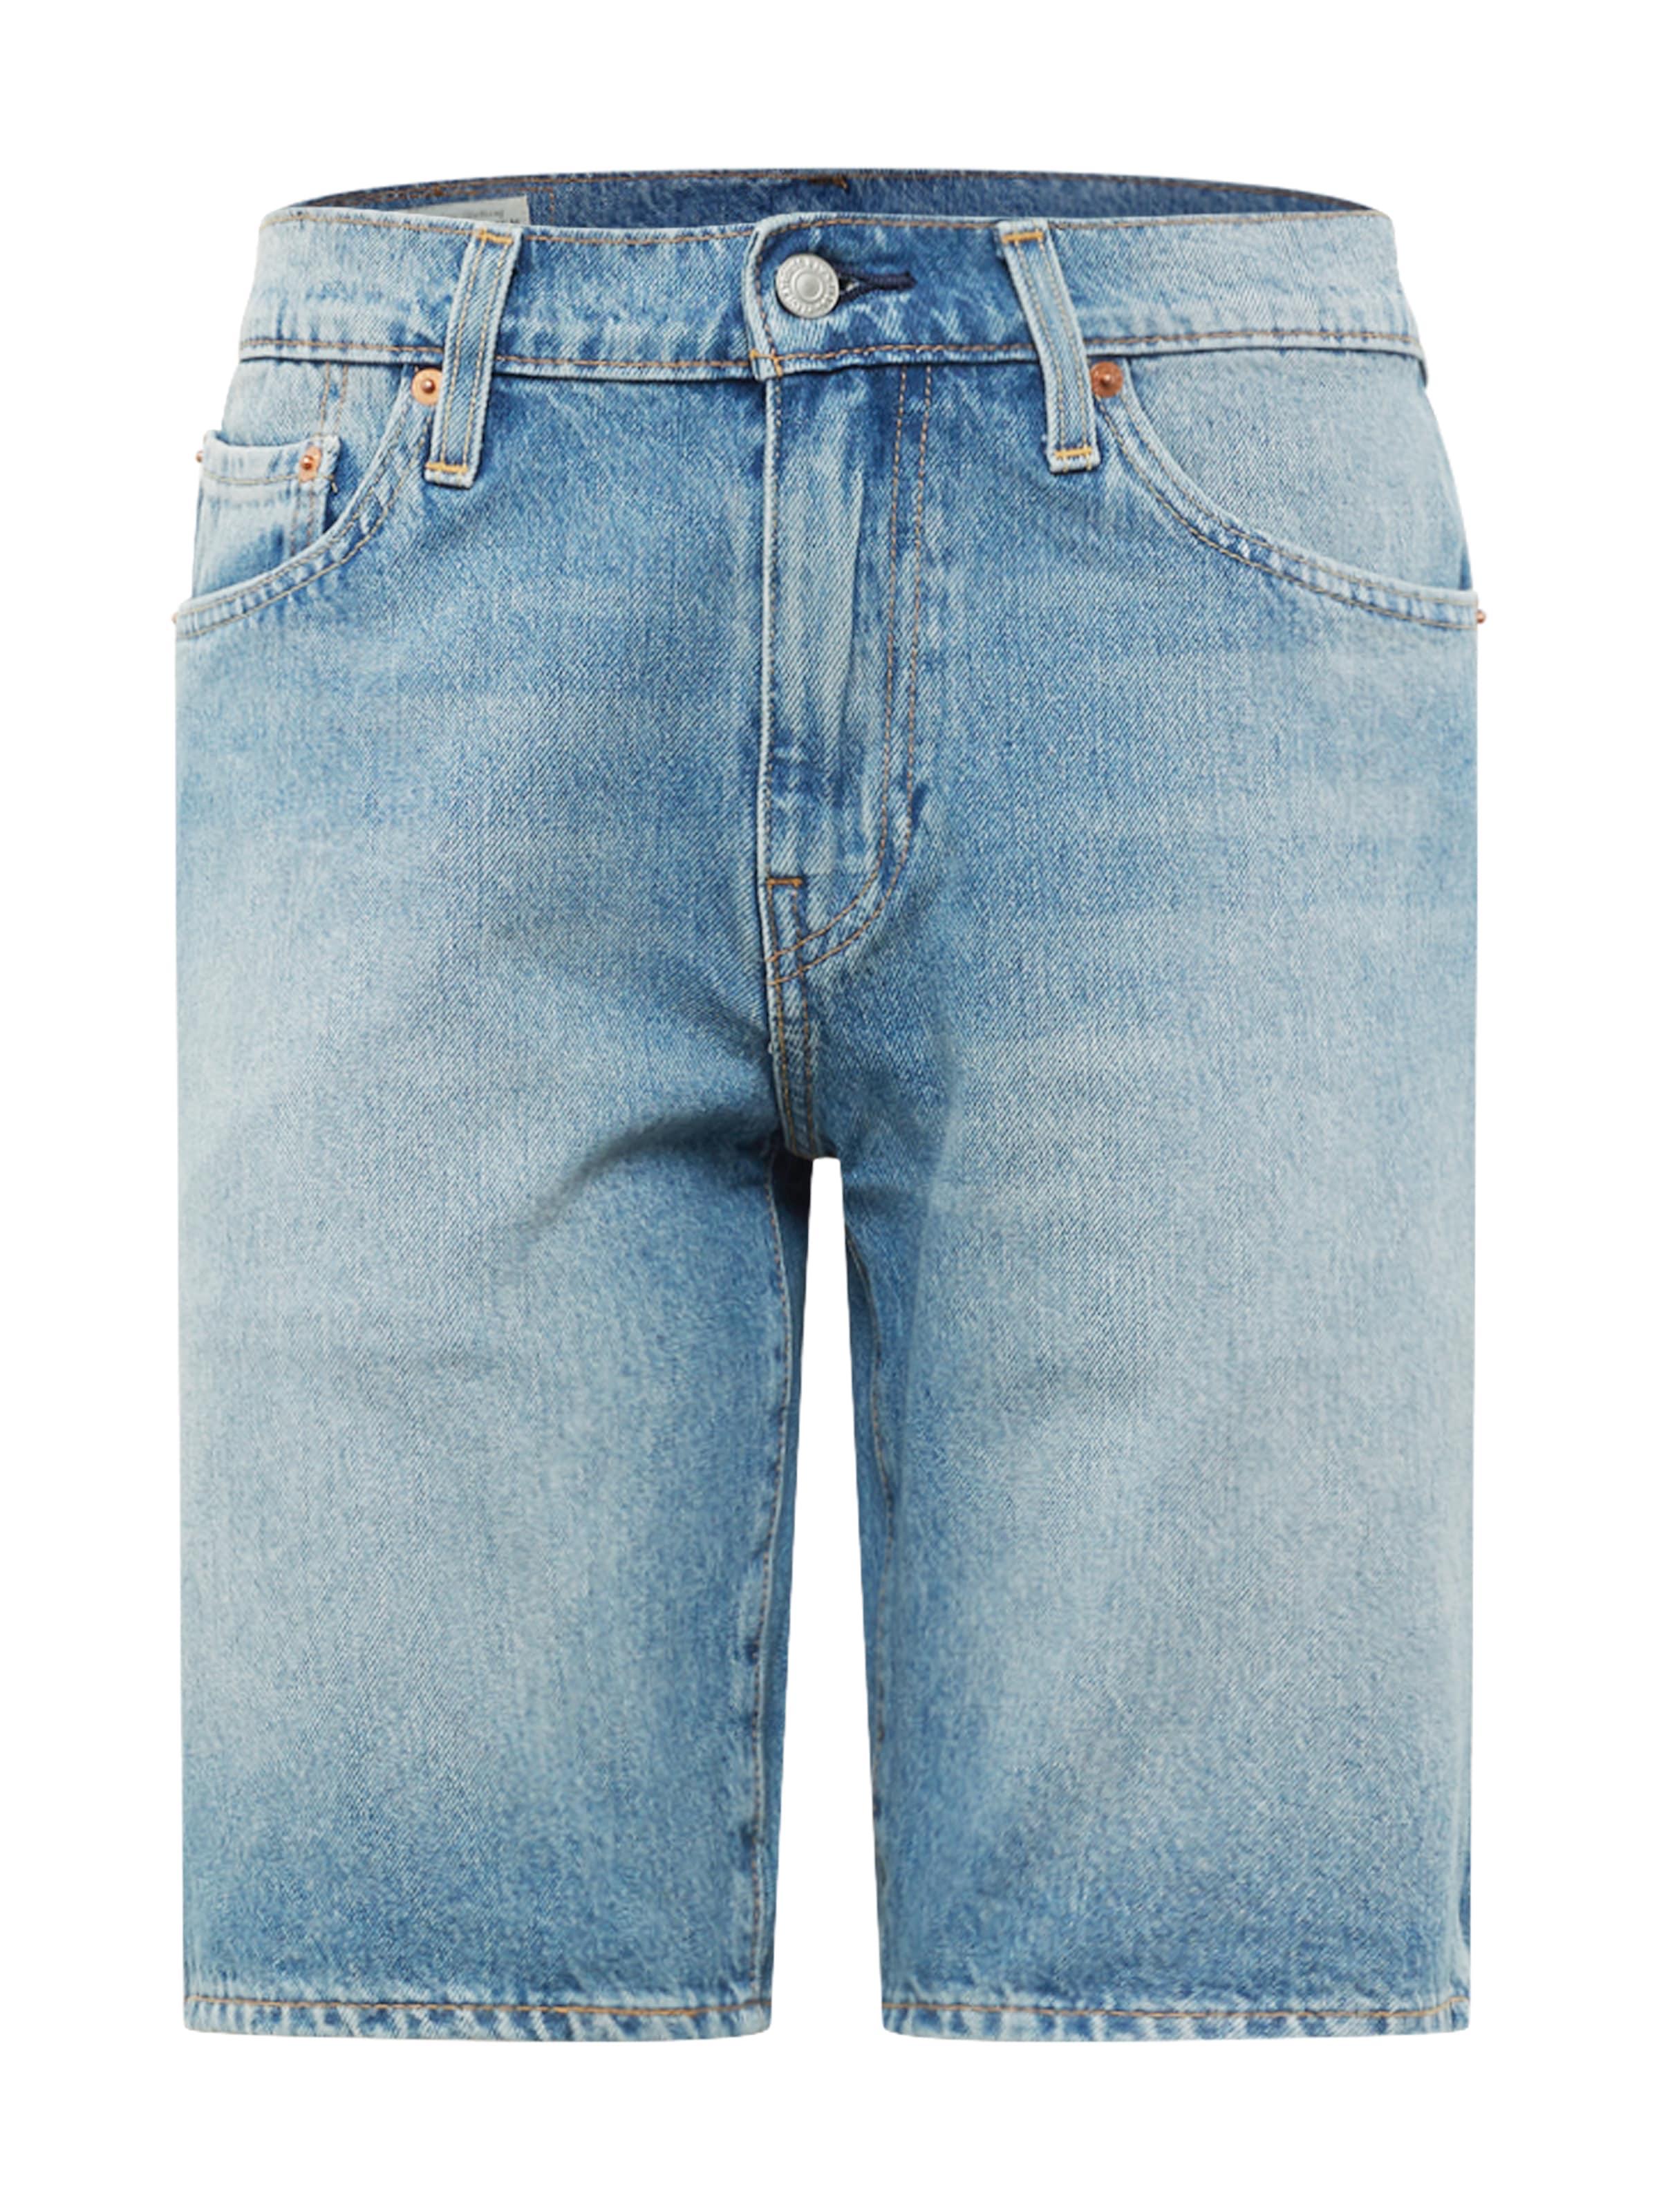 Jeans Denim In Blue Levi's In Jeans Denim Levi's Blue Jeans Levi's Onwmv0y8N